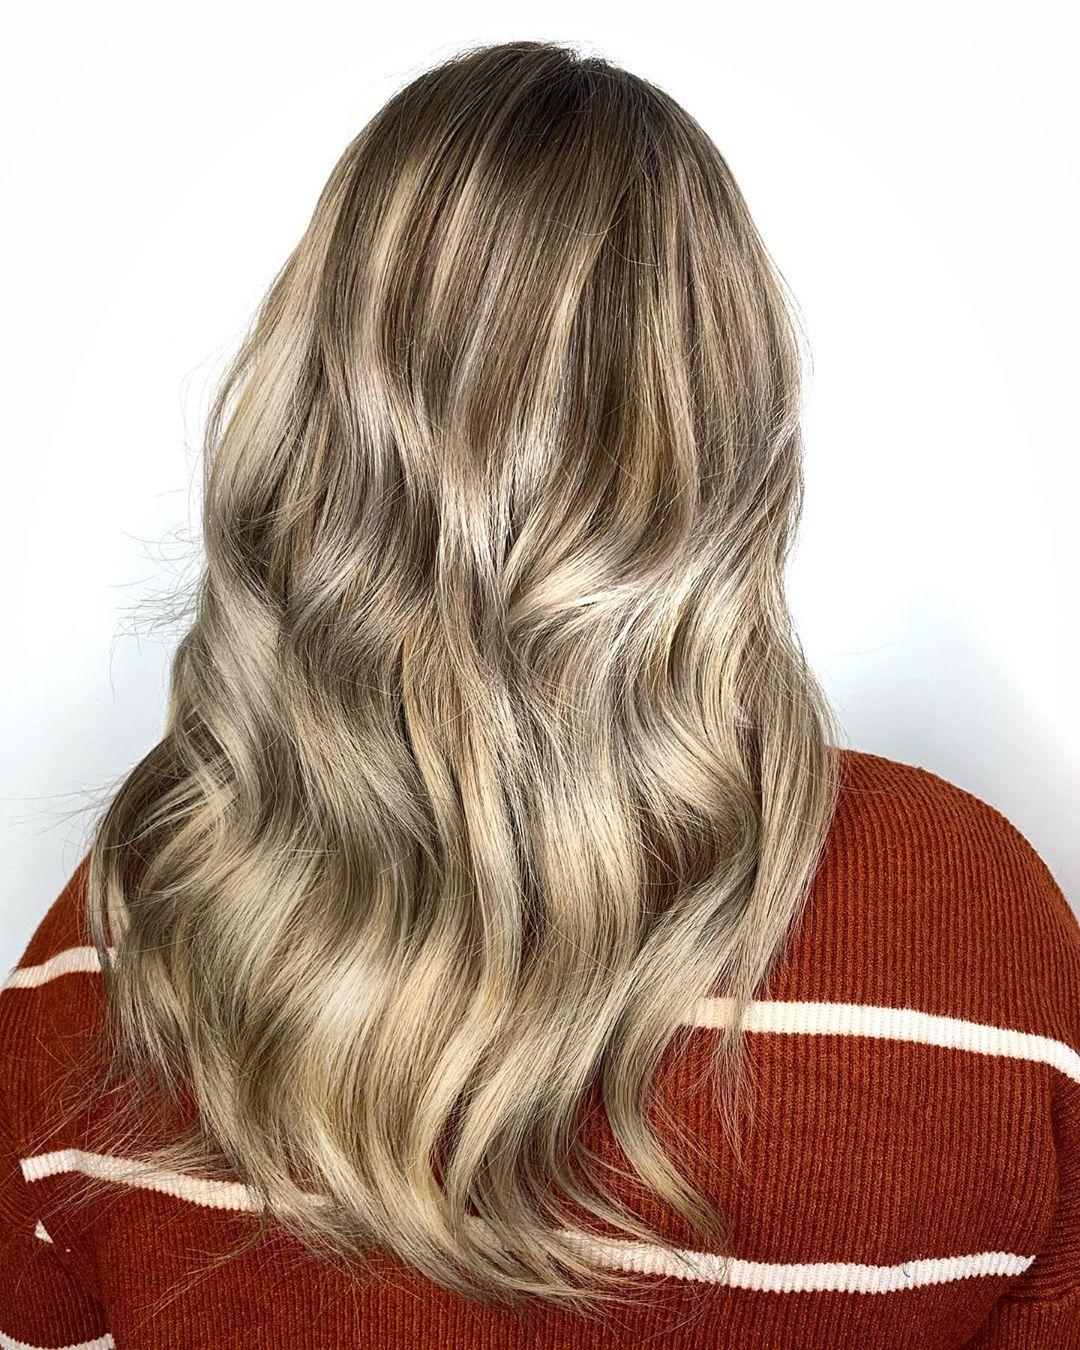 Lowlights for light blonde hair